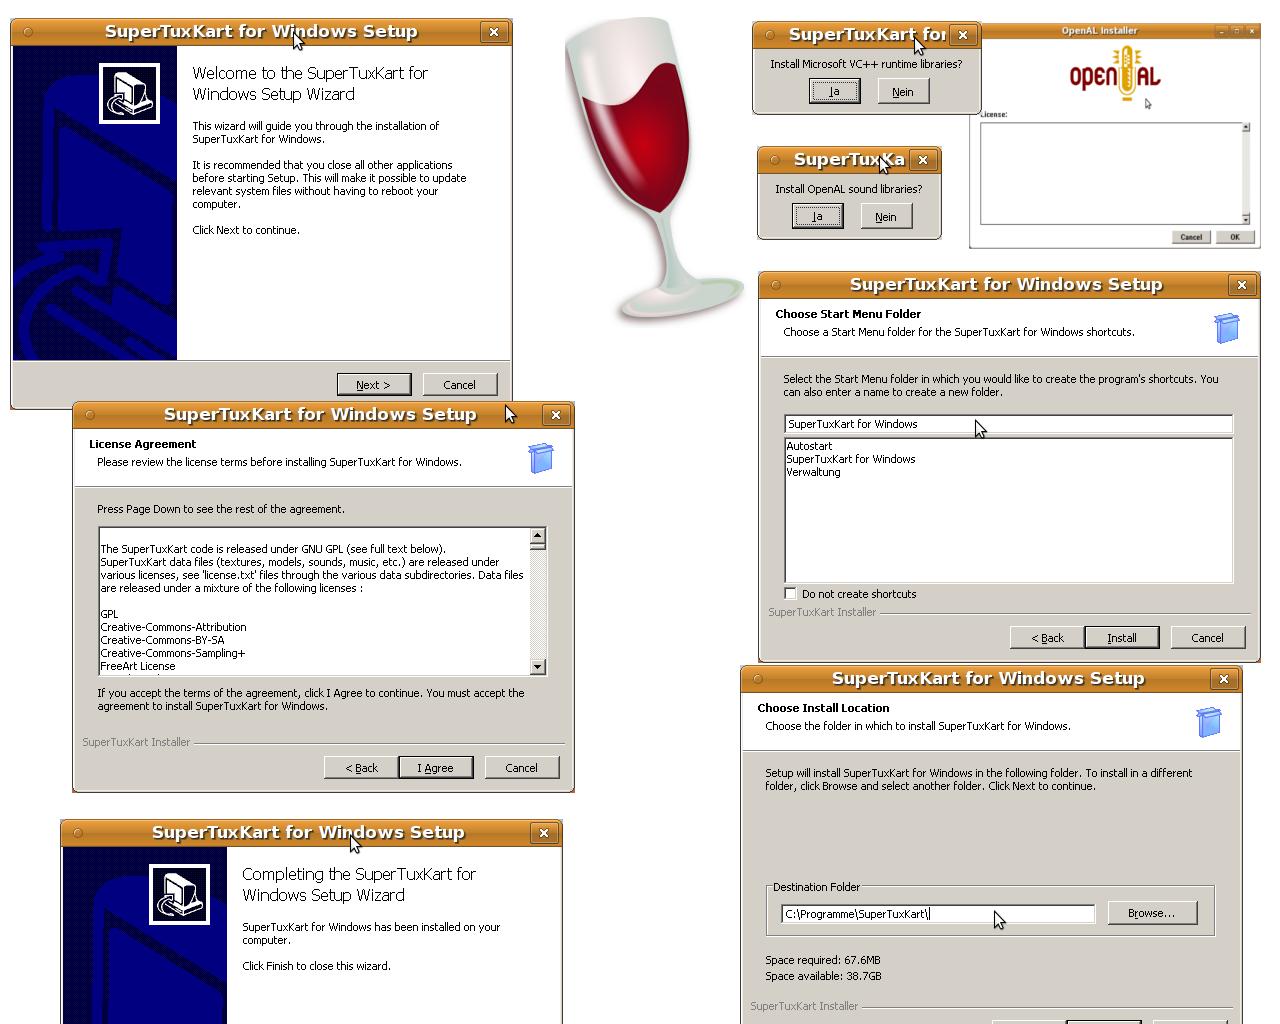 supertuxkart.de - SuperTuxKart Windows- und Wine-Screenshots